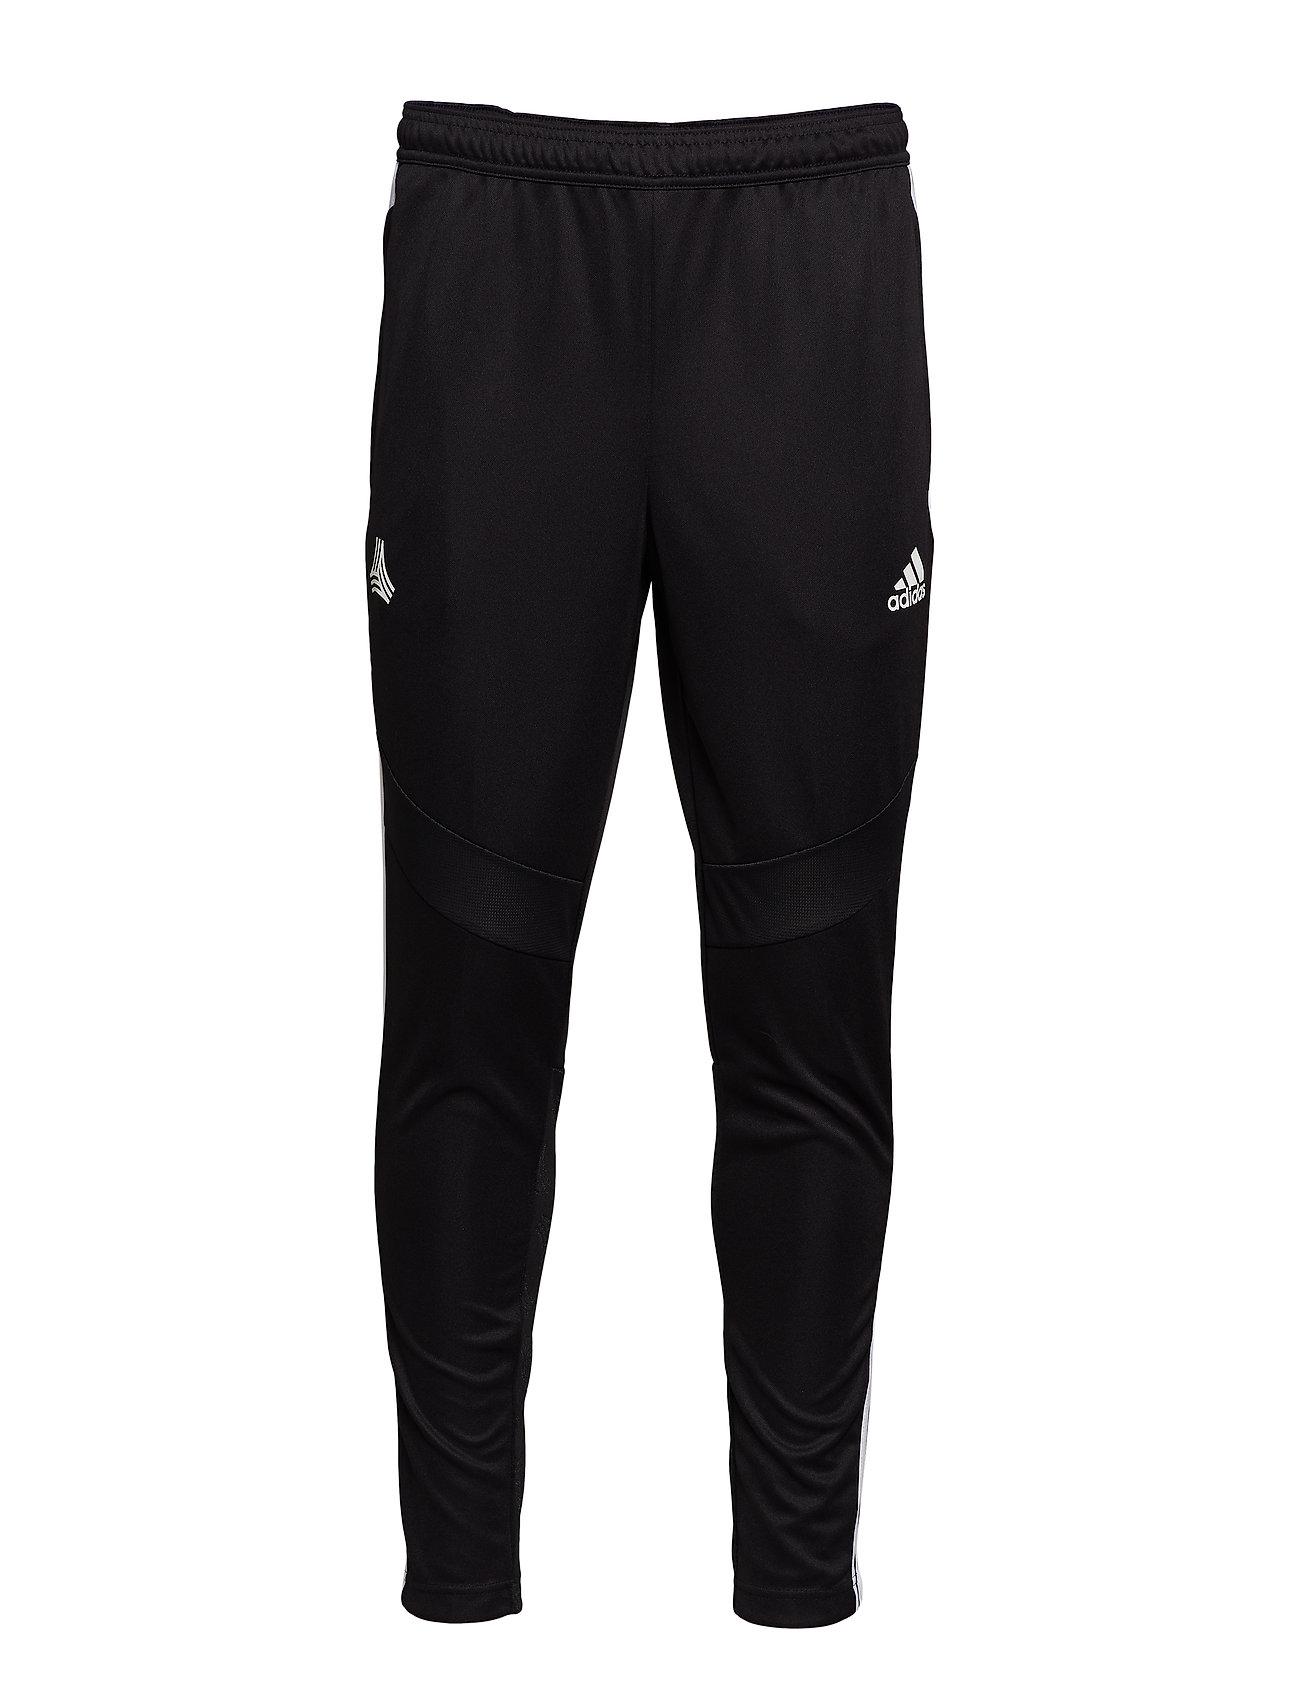 adidas Performance TAN TR PANT - BLACK/WHITE